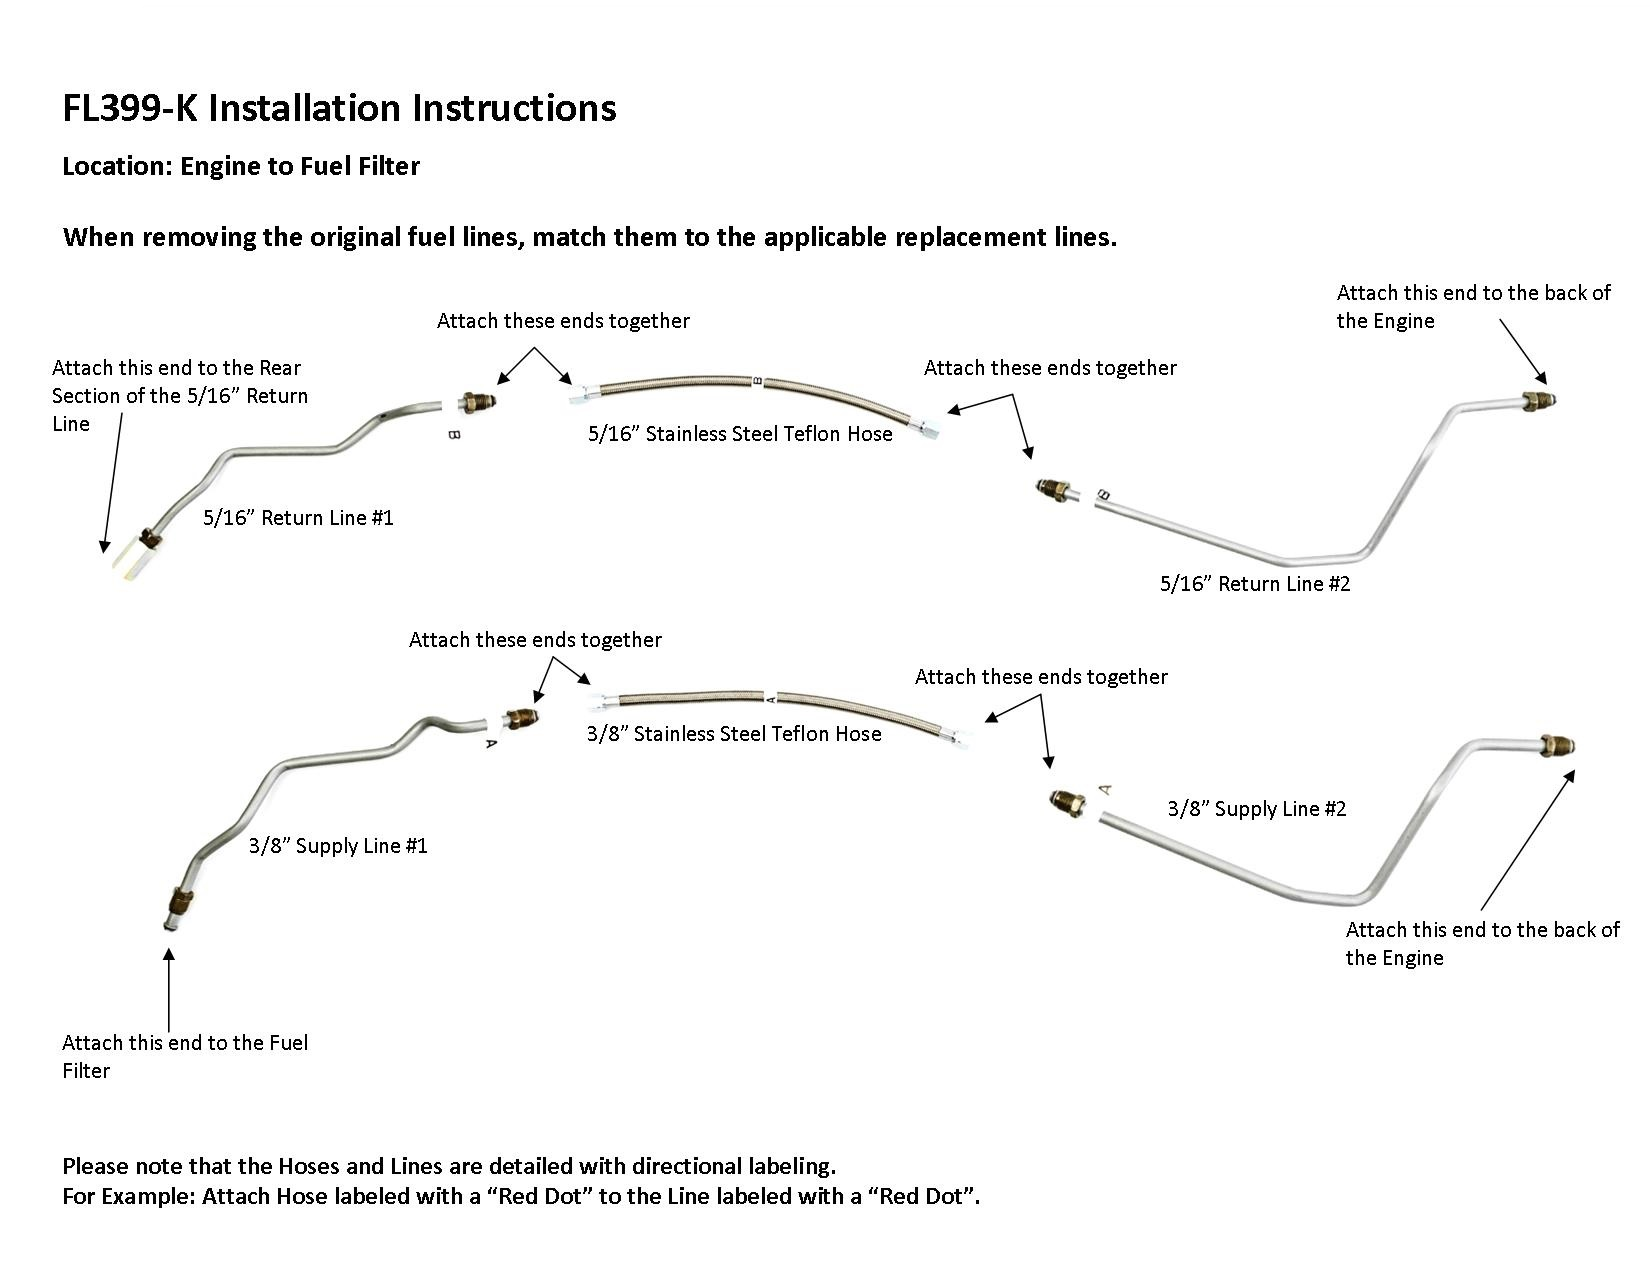 hight resolution of 98 00 tahoe yukon escalade installation instructions fl399